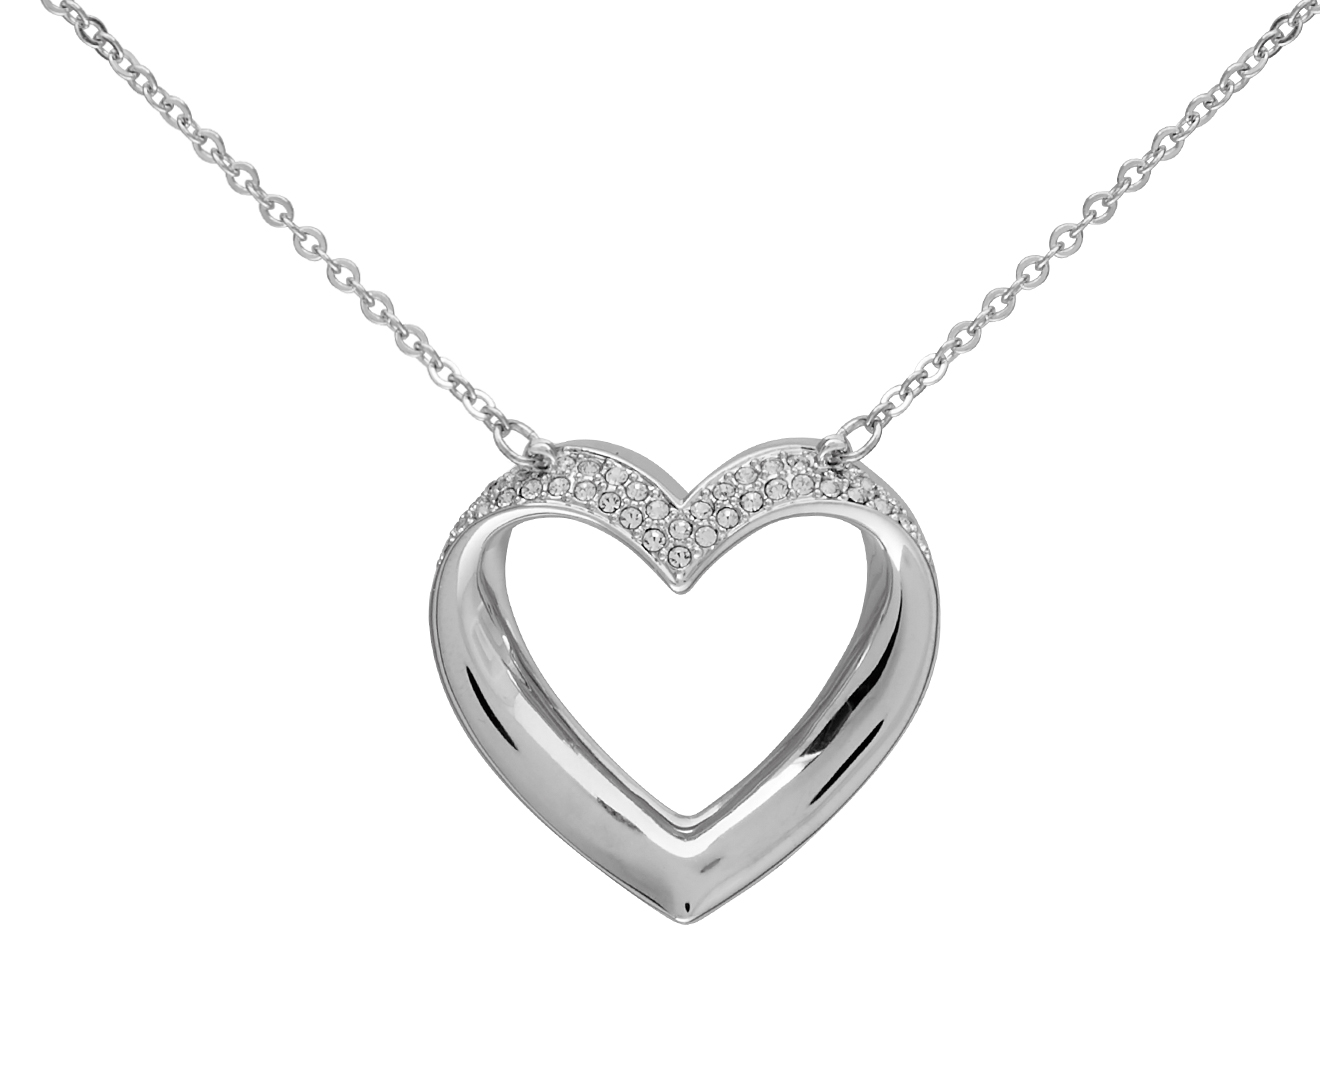 1b74b33aceb76 Swarovski® Cupidon Necklace & Earring Set - Crystal/Rhinestone ...